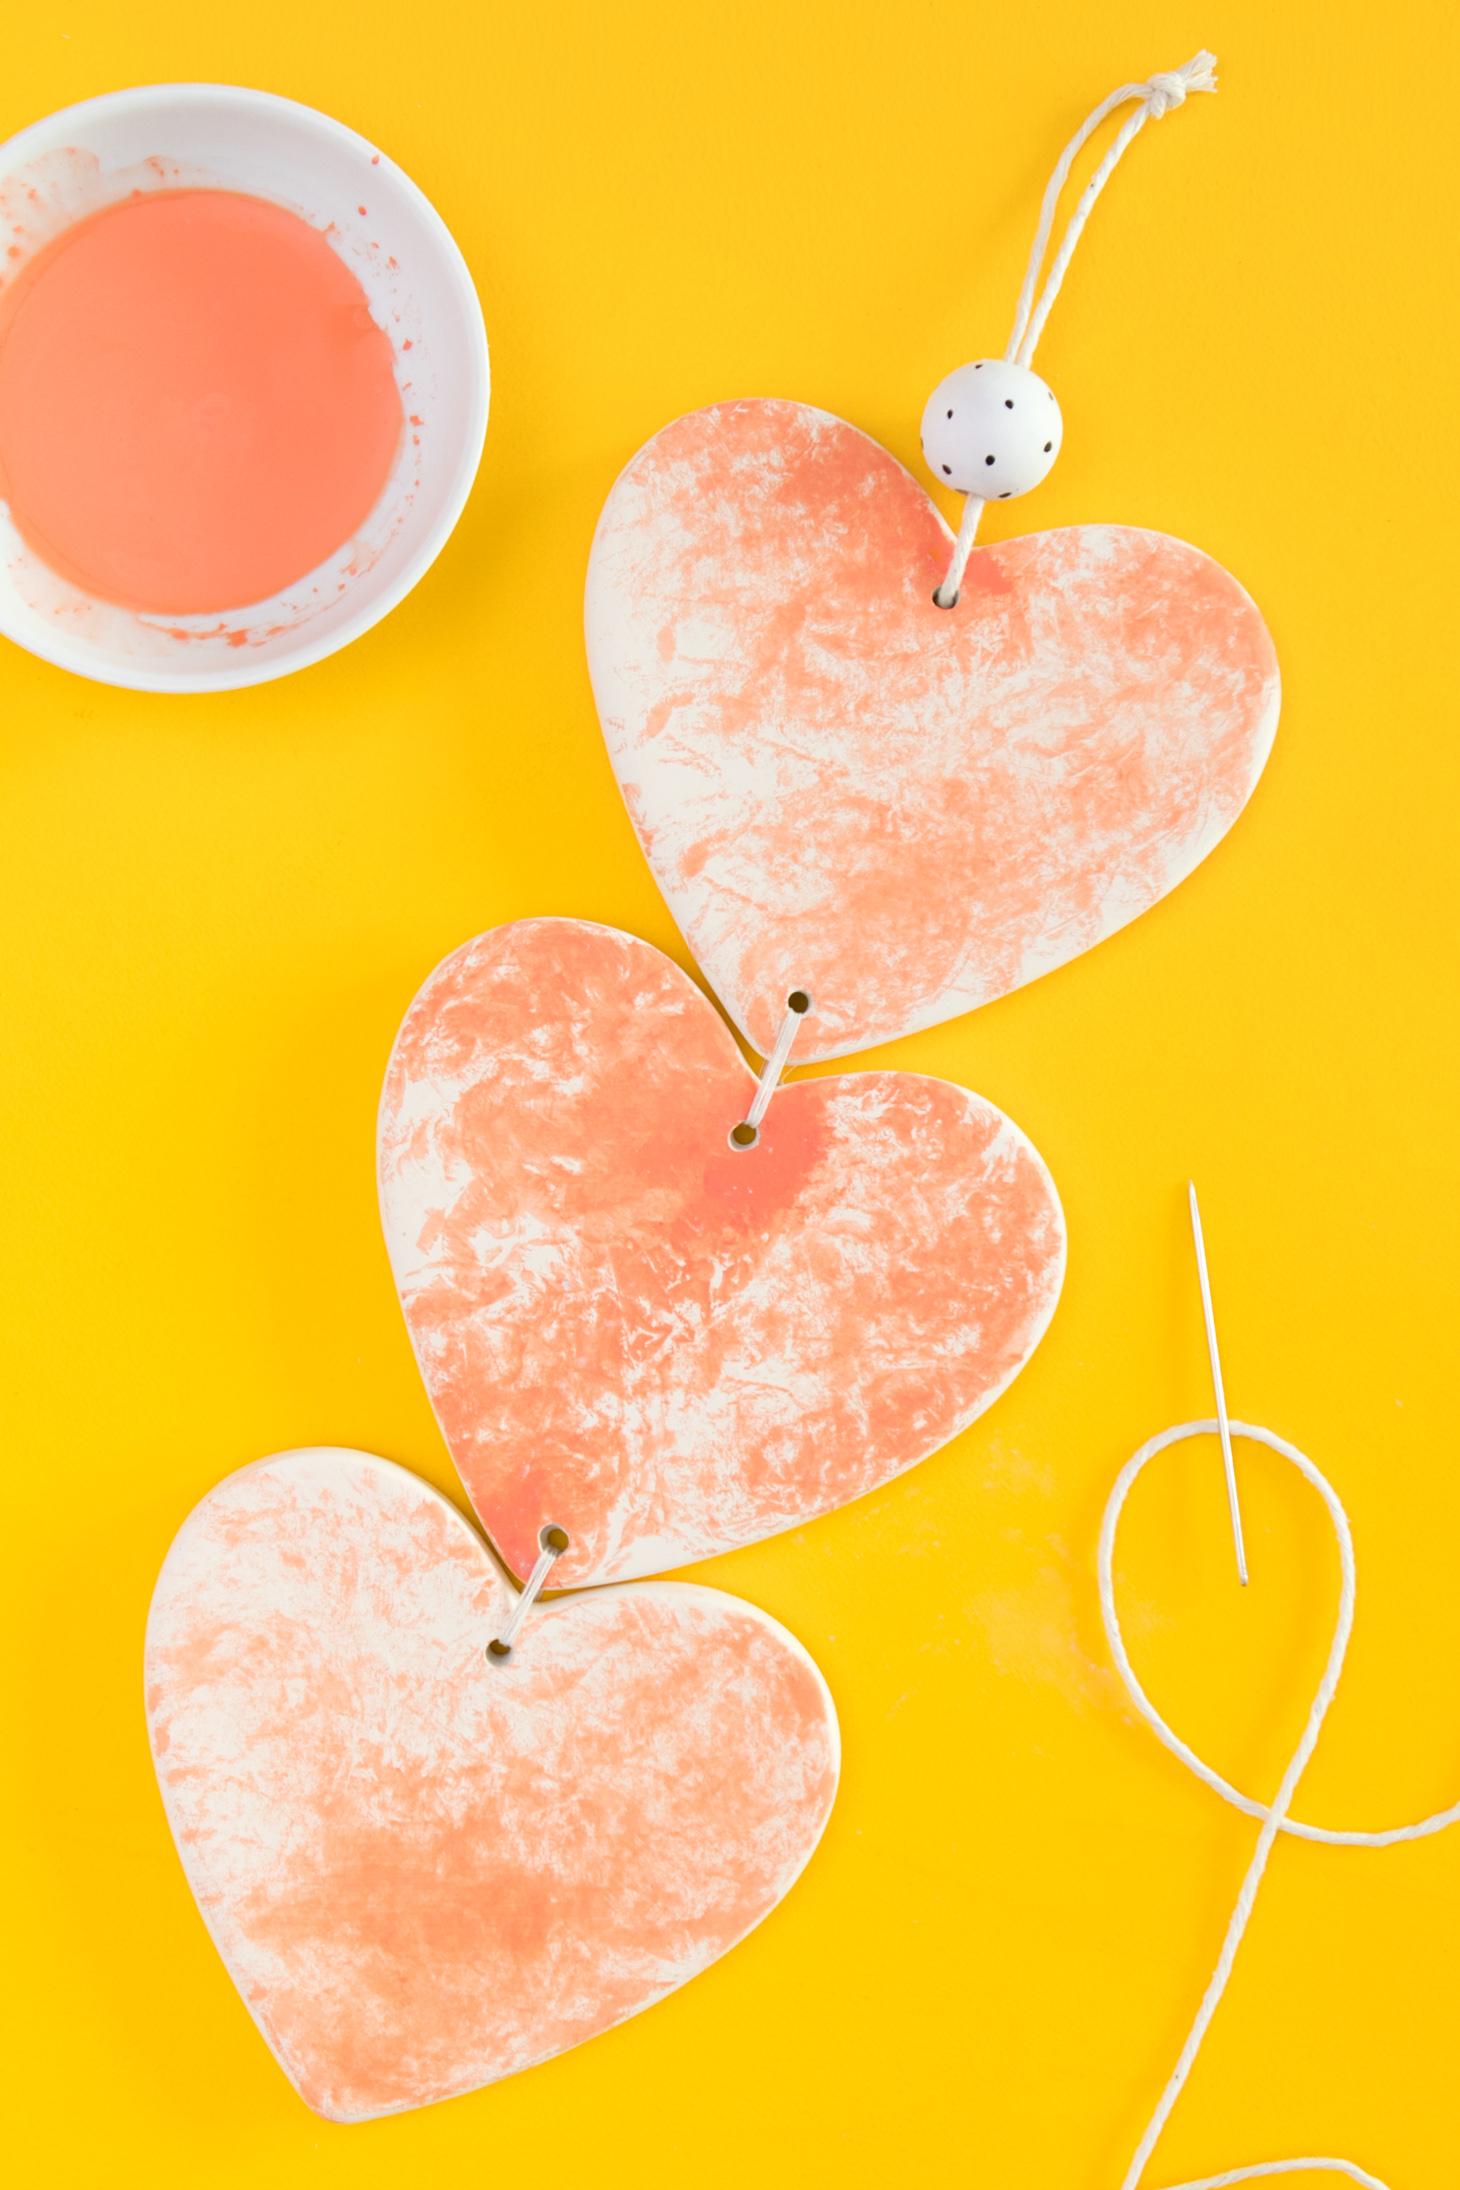 DIY Ceramic Heart Wall Hanging - Sarah Hearts